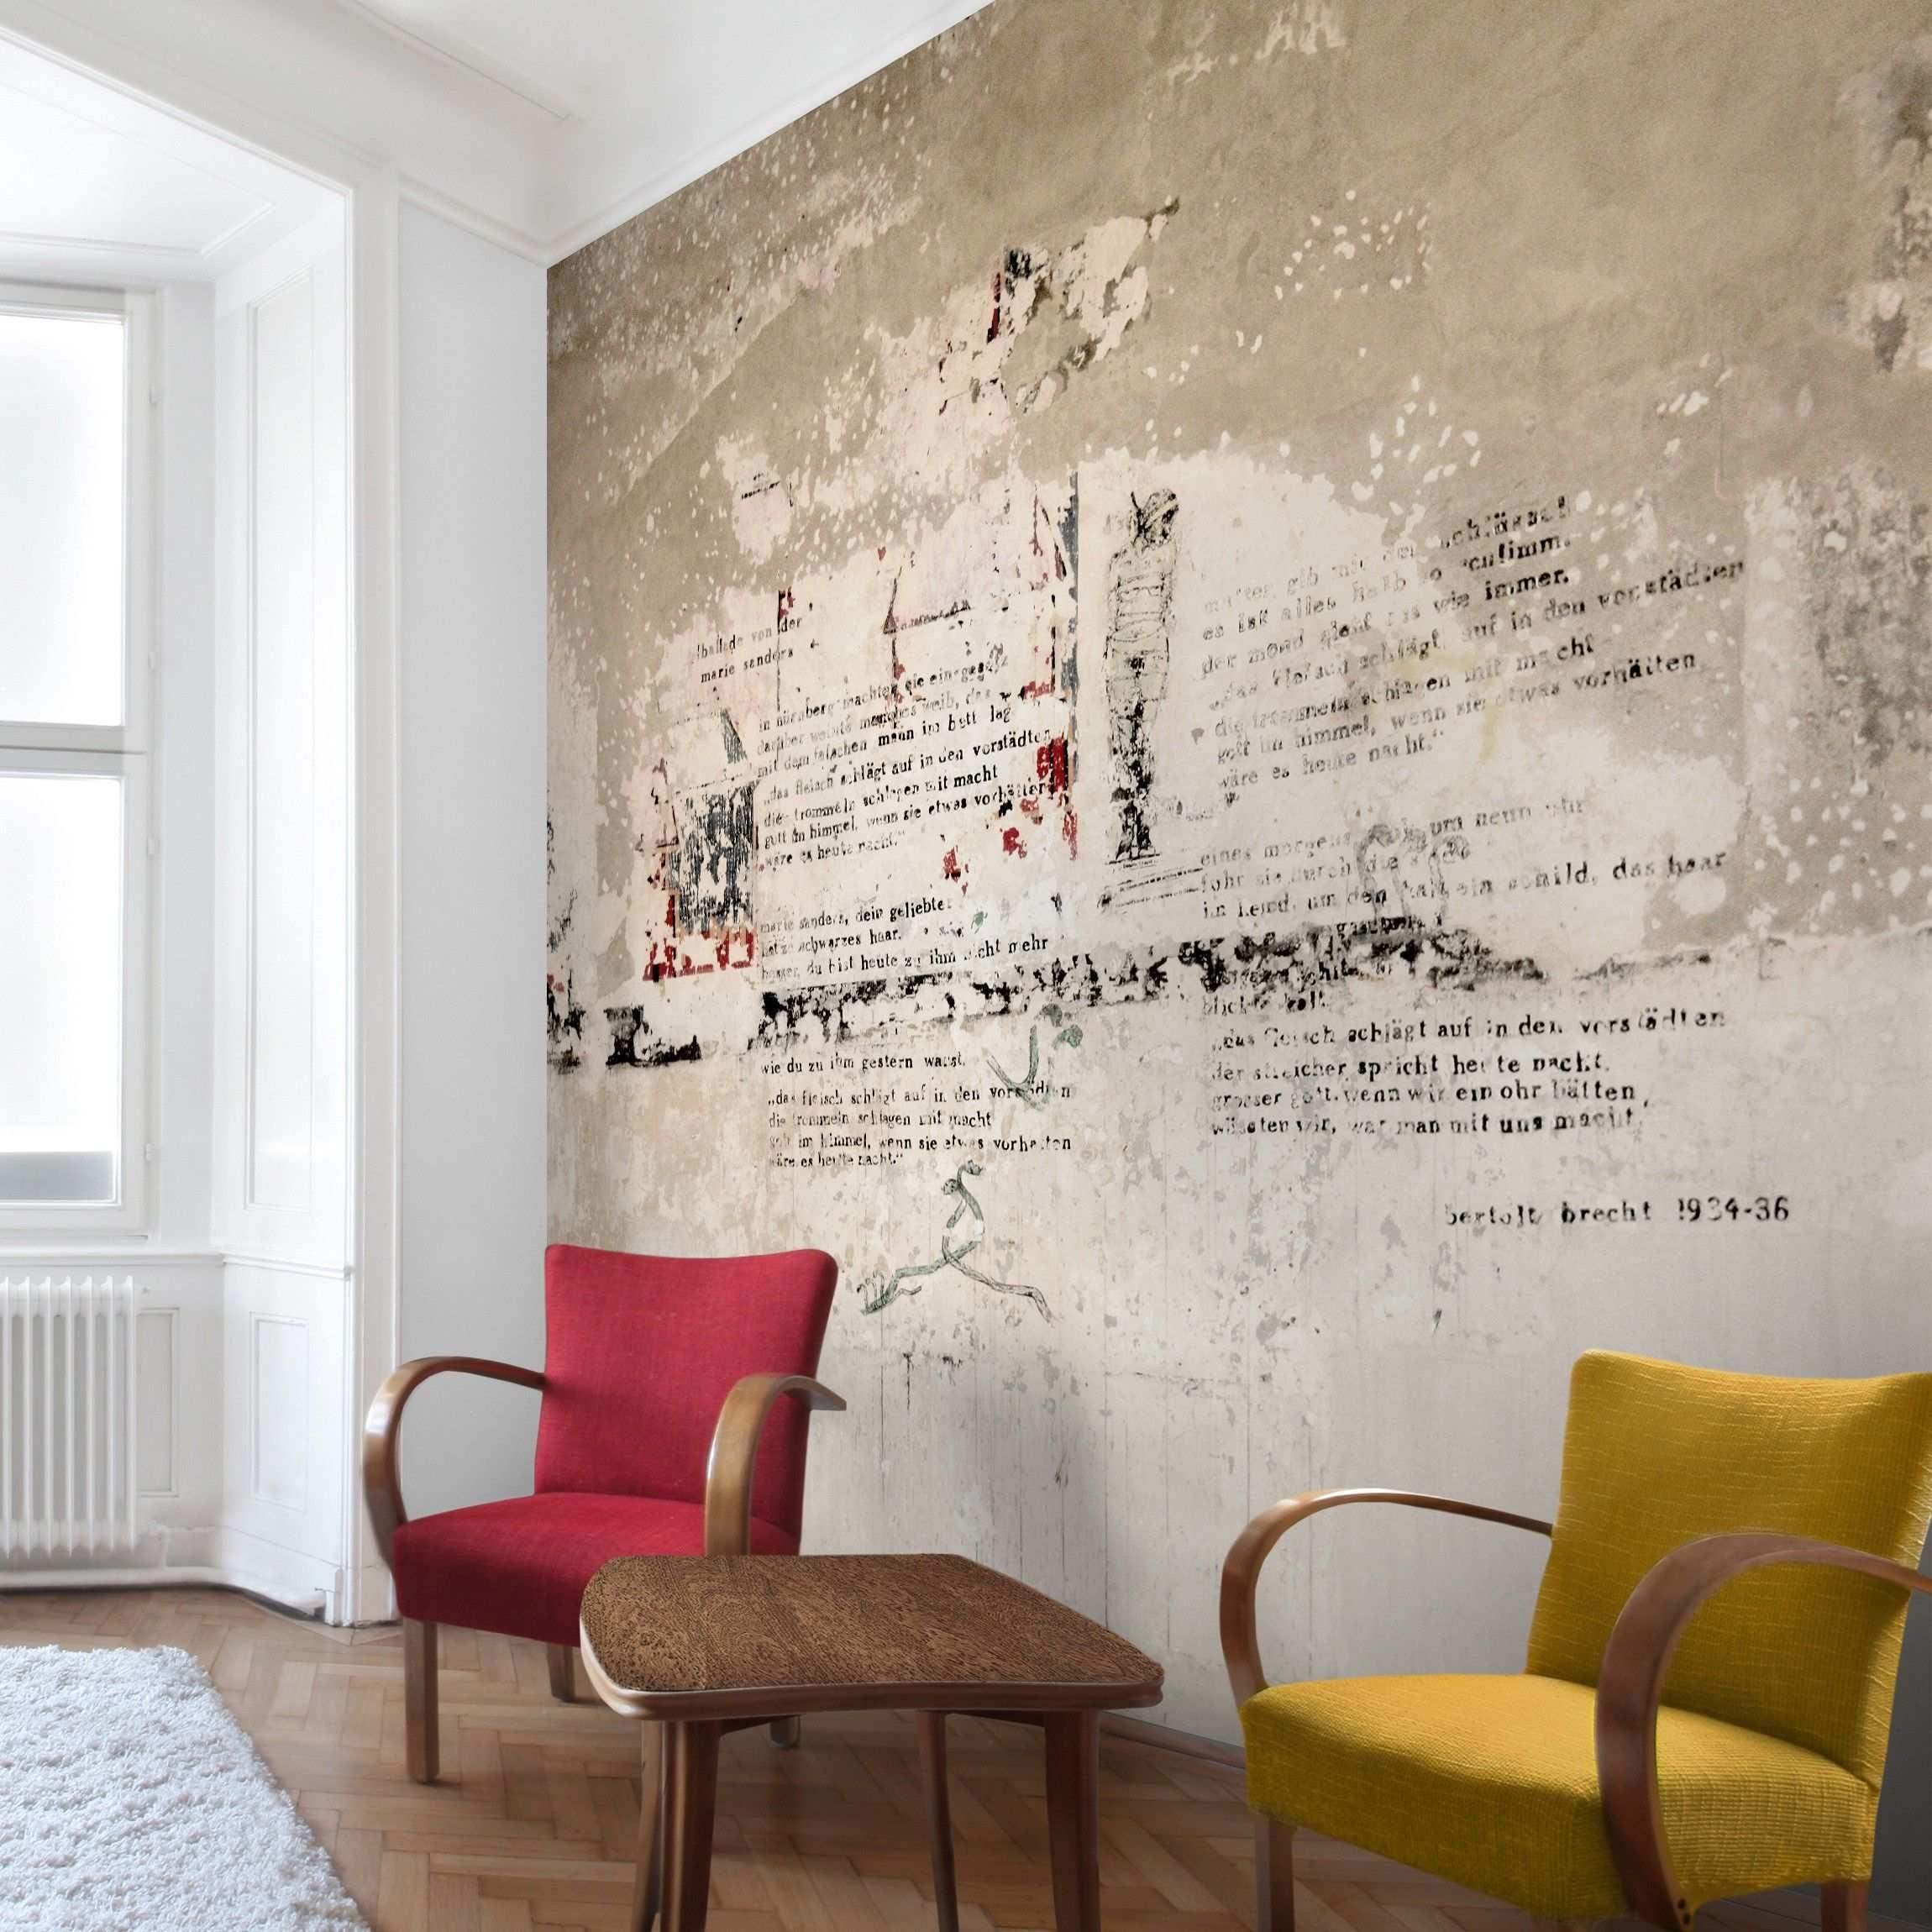 Vliestapete Betonoptik Fototapete Betonwand Bertolt Quadrat Tapete Brecht Versen Alte Mittapete Betonoptik Al Home Wallpaper Distressed Walls Wall